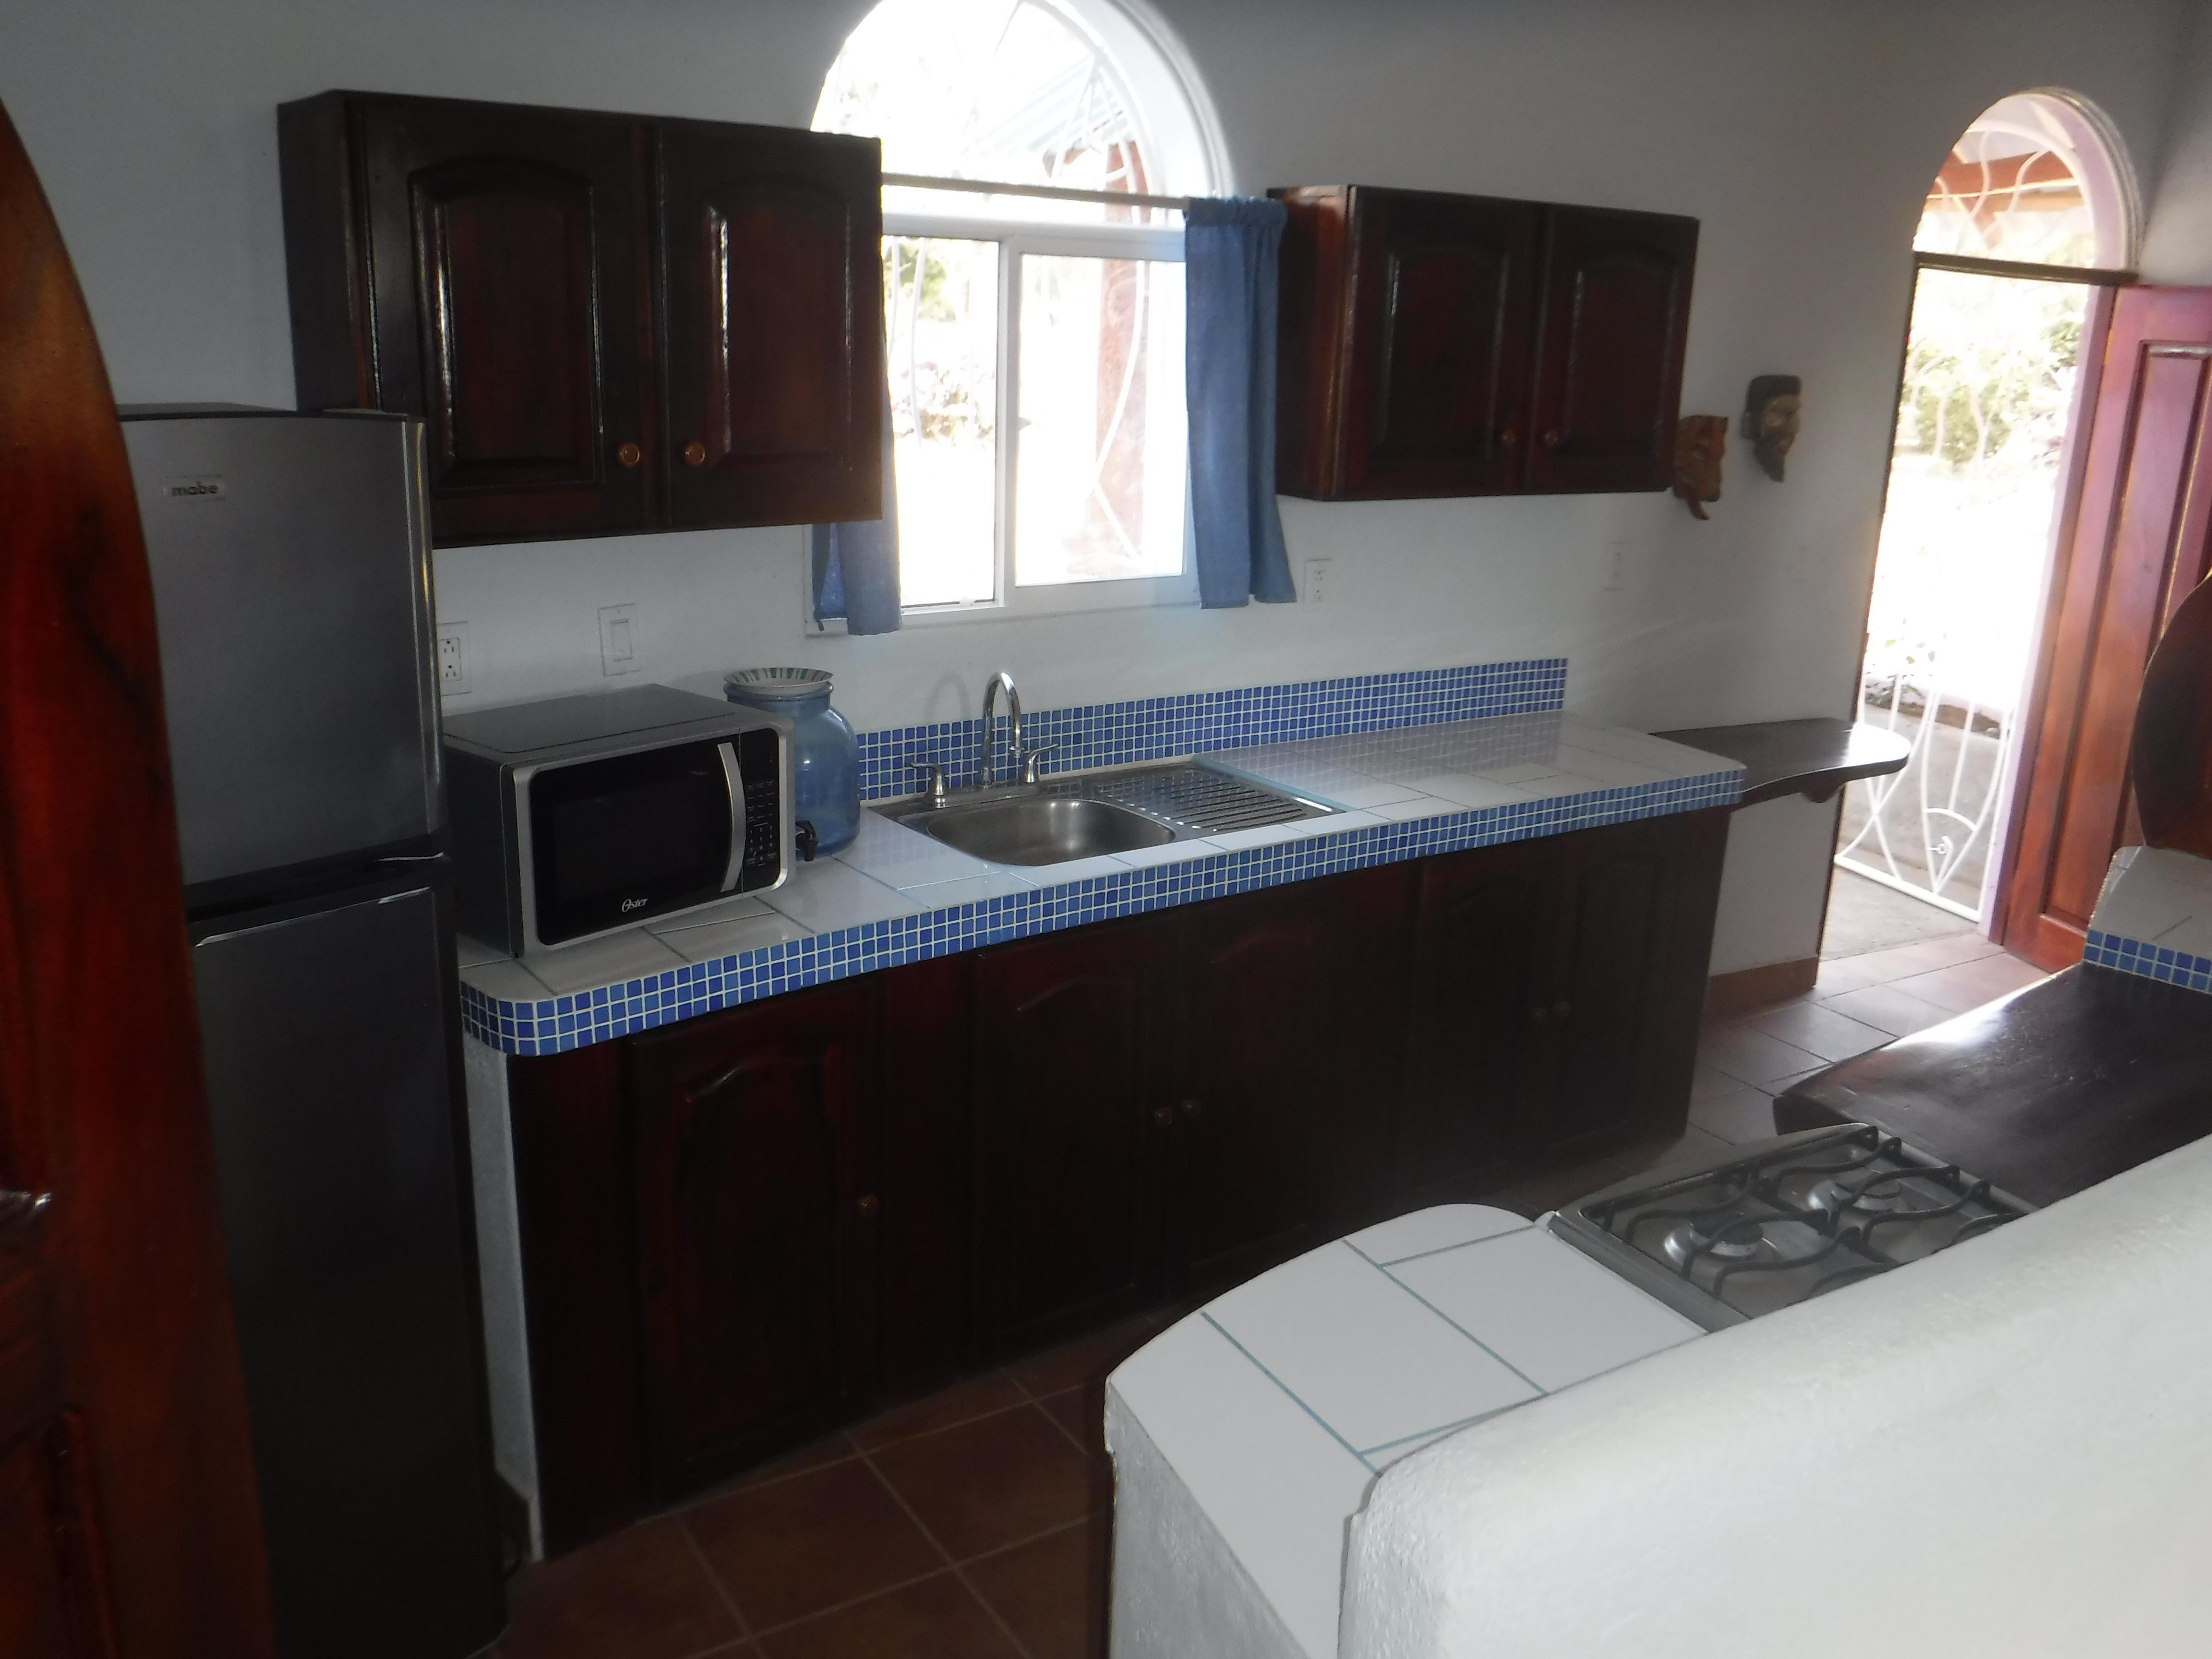 Prado Hills Update and OBrien Delicias Casa 077